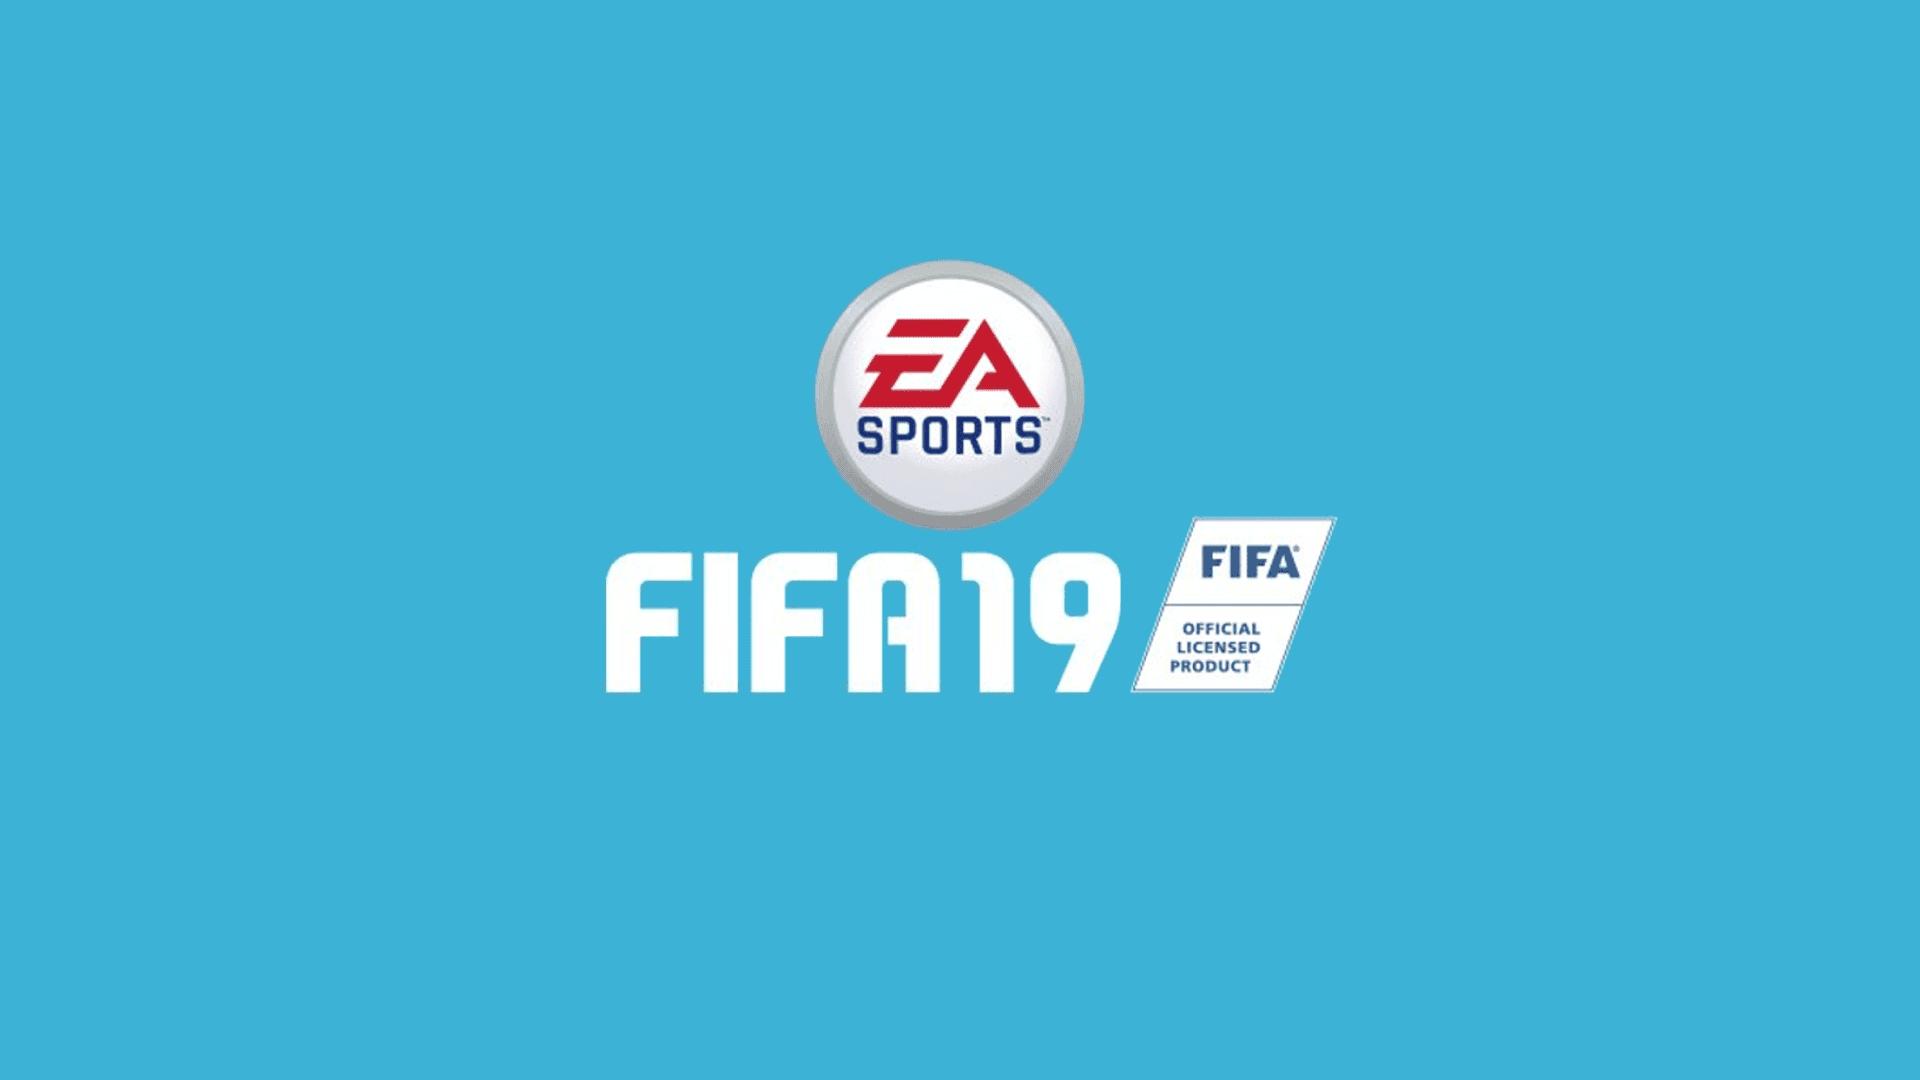 FIFA 19 parece incluir la Superliga China